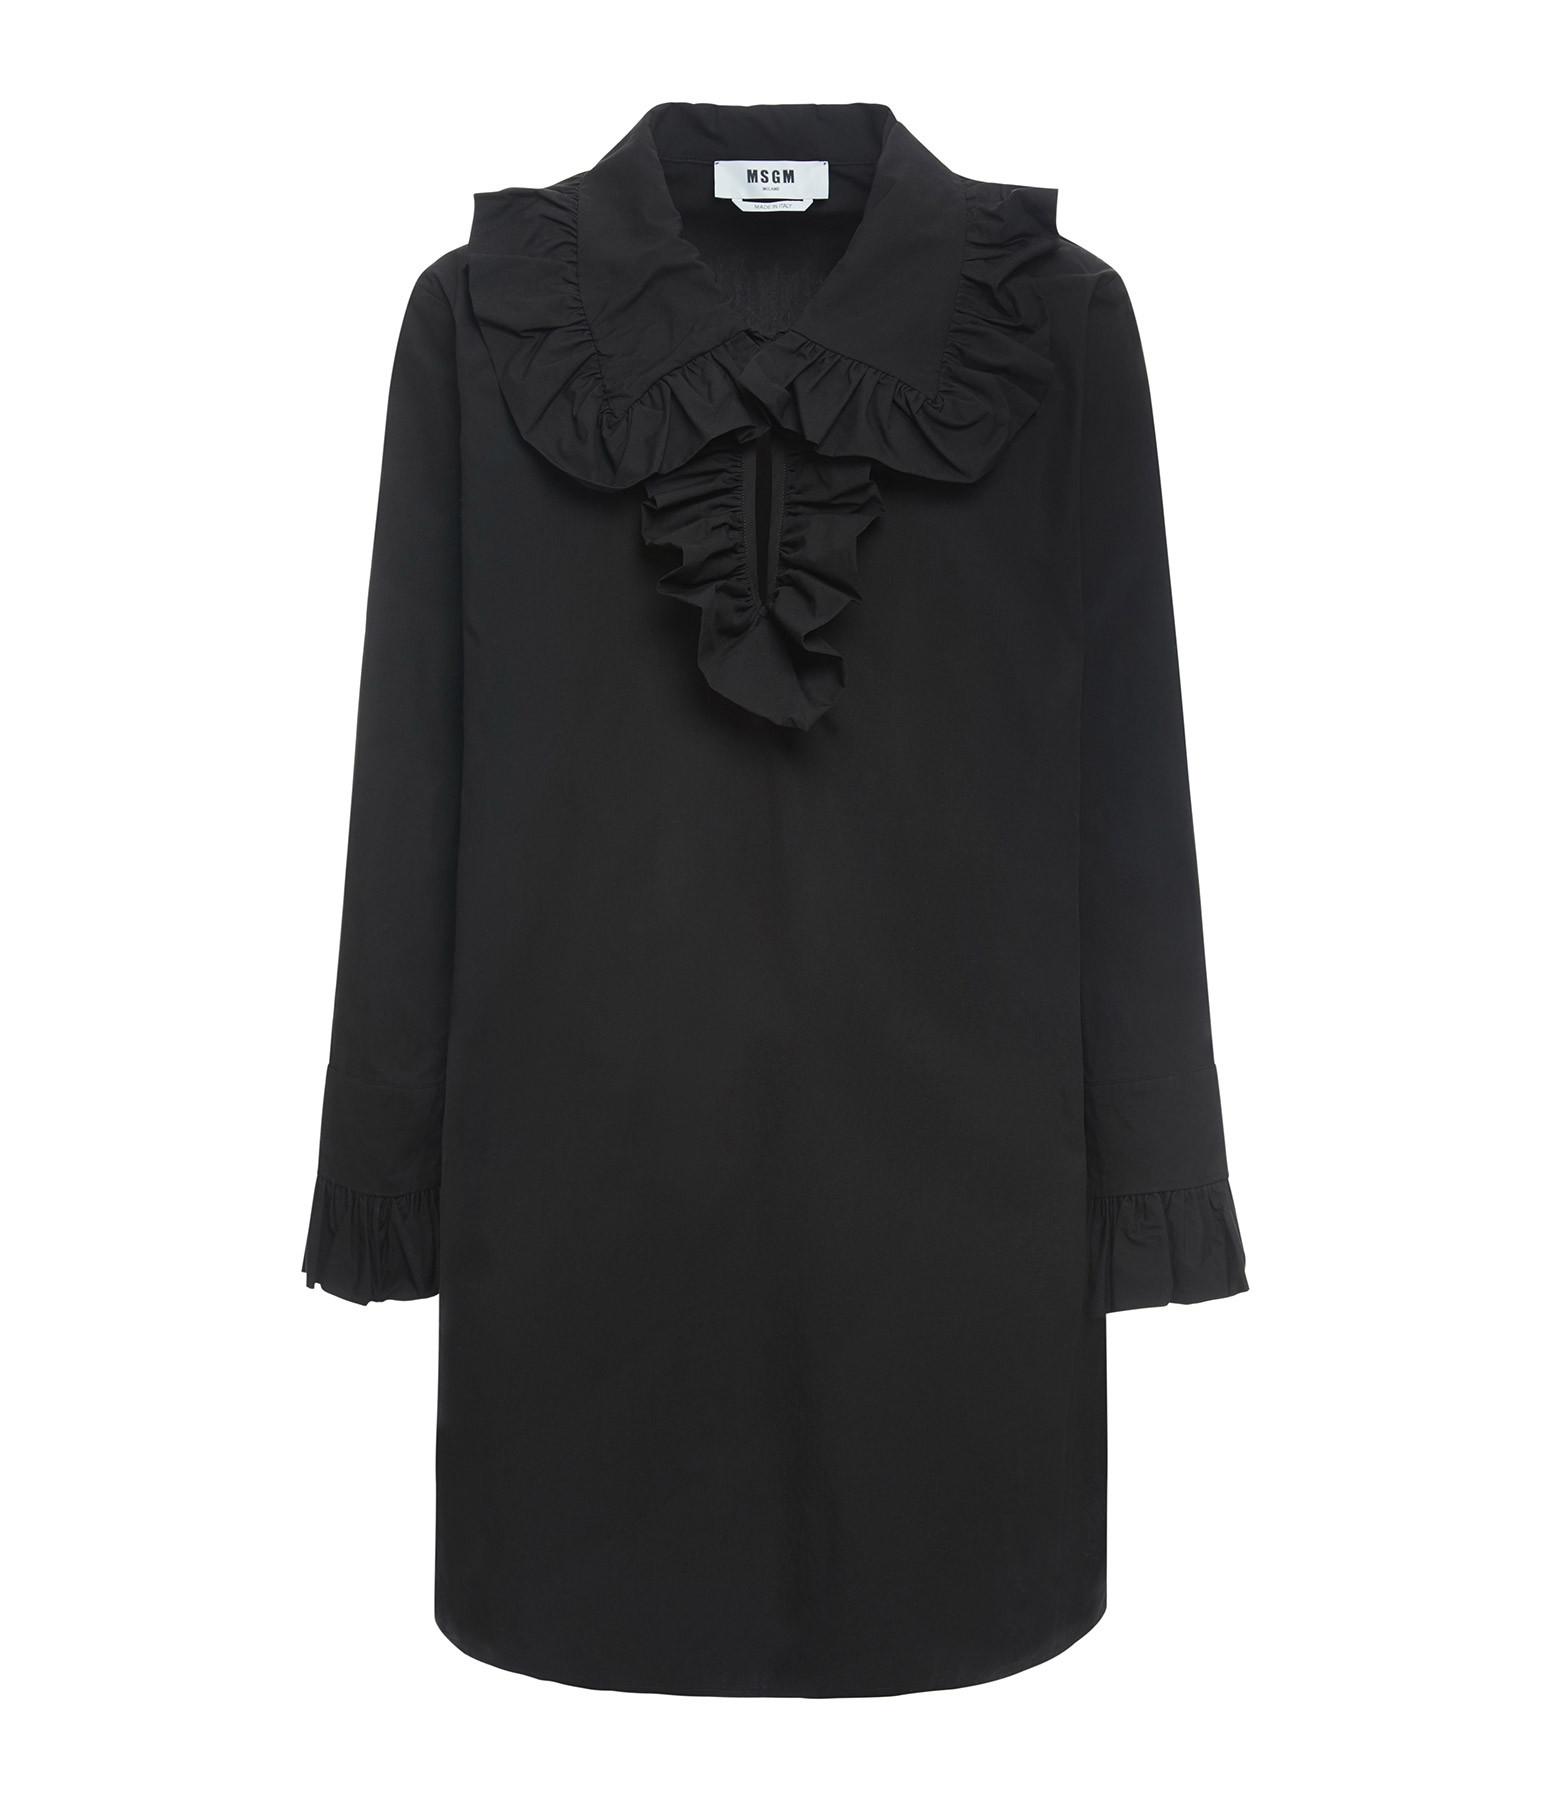 MSGM - Robe Noir